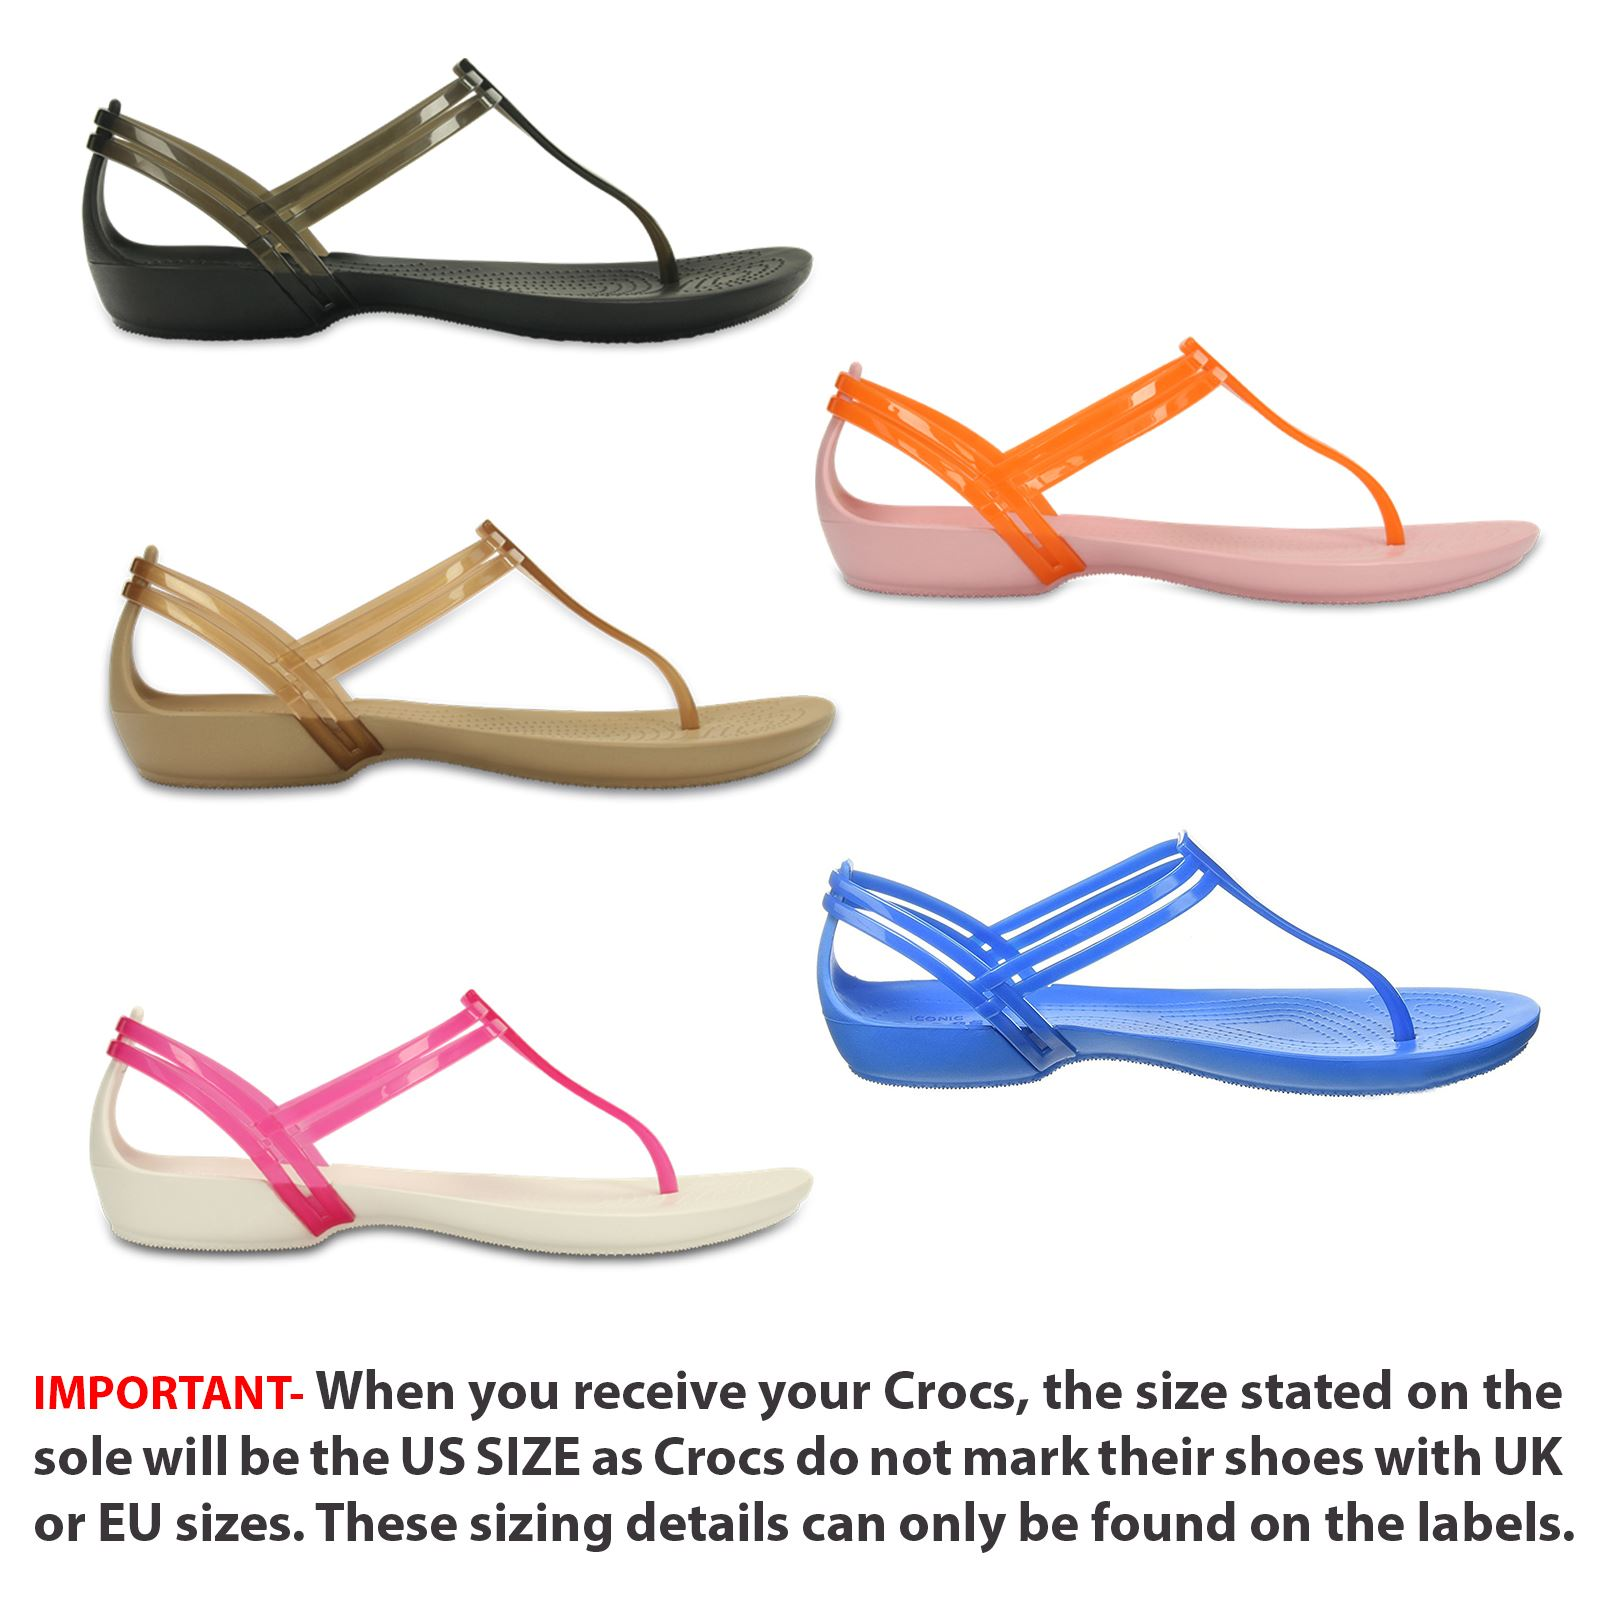 Cena obniżona najlepszy wybór niska cena Details about Crocs Isabella T-Strap Relaxed Fit Sandals in Wide Range of  Colours 202467